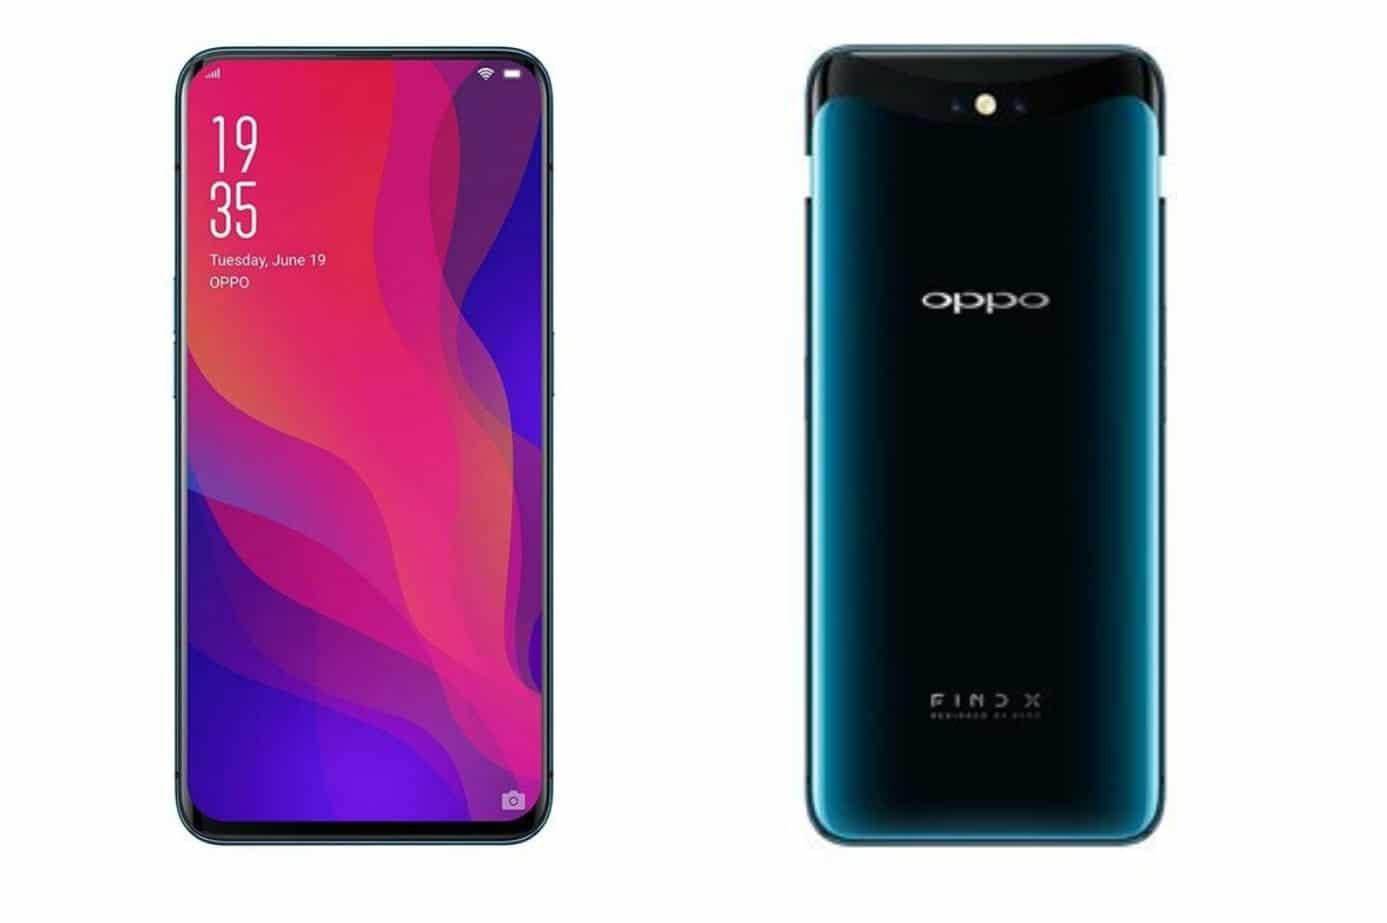 Nouveau smartphone Oppo Find X